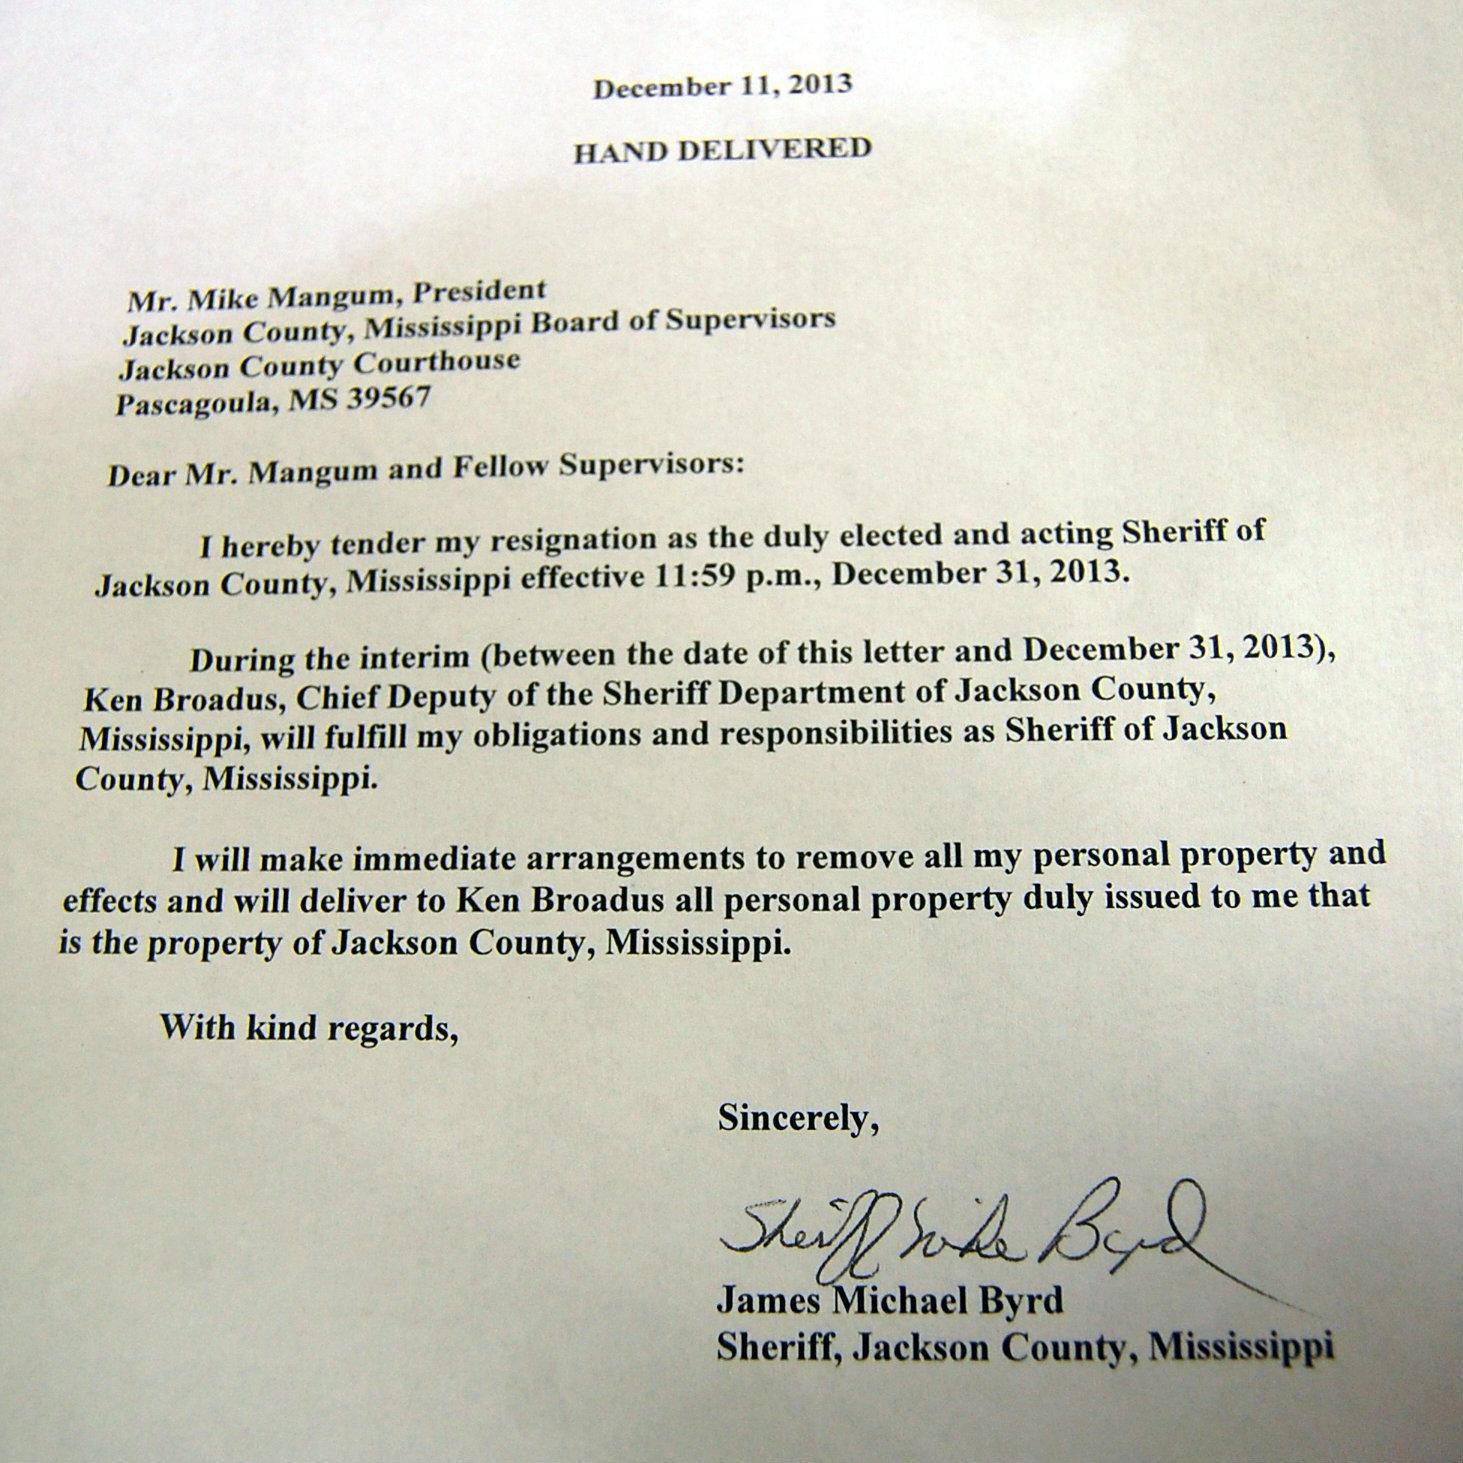 Official Letter Of Resignation Formal Letter Of Resignation Gets